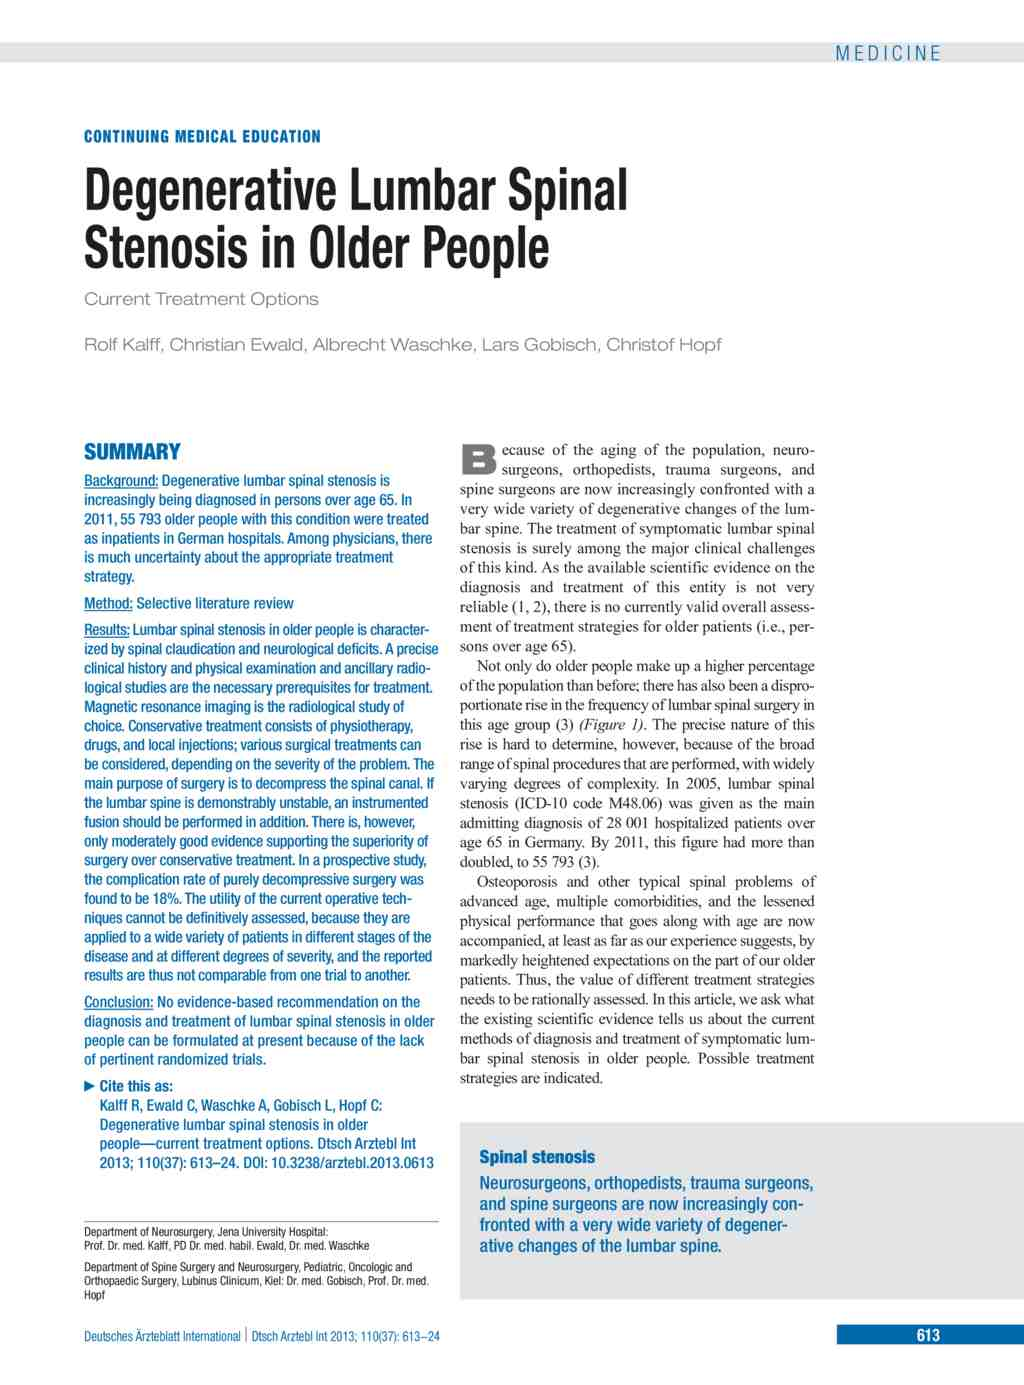 degenerative lumbar spinal stenosis in older people (13.09.2013)